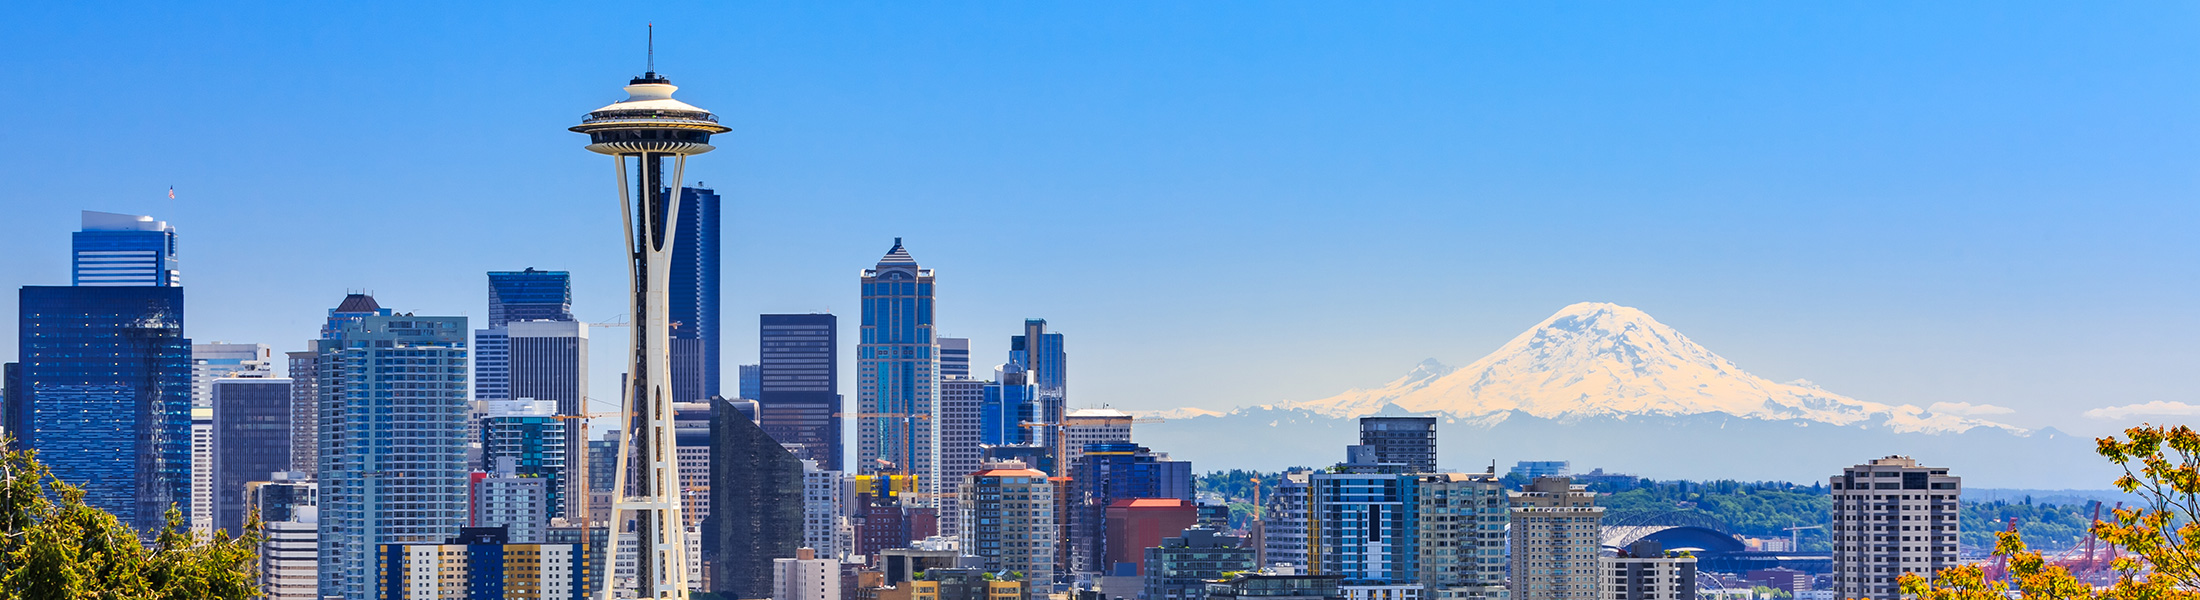 Seattle City Skyline in North America